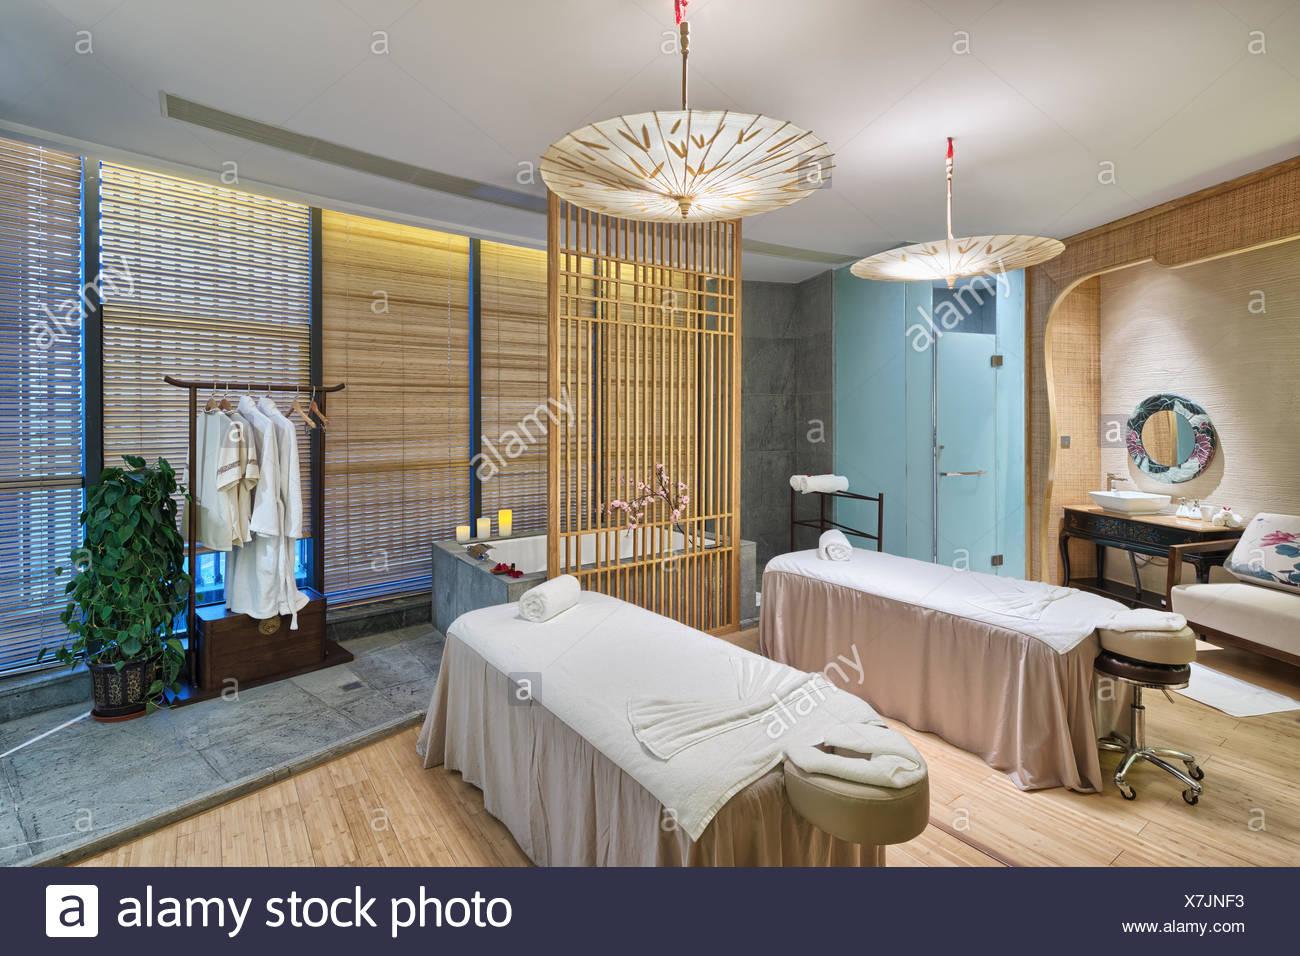 interior of modern spas room - Stock Image